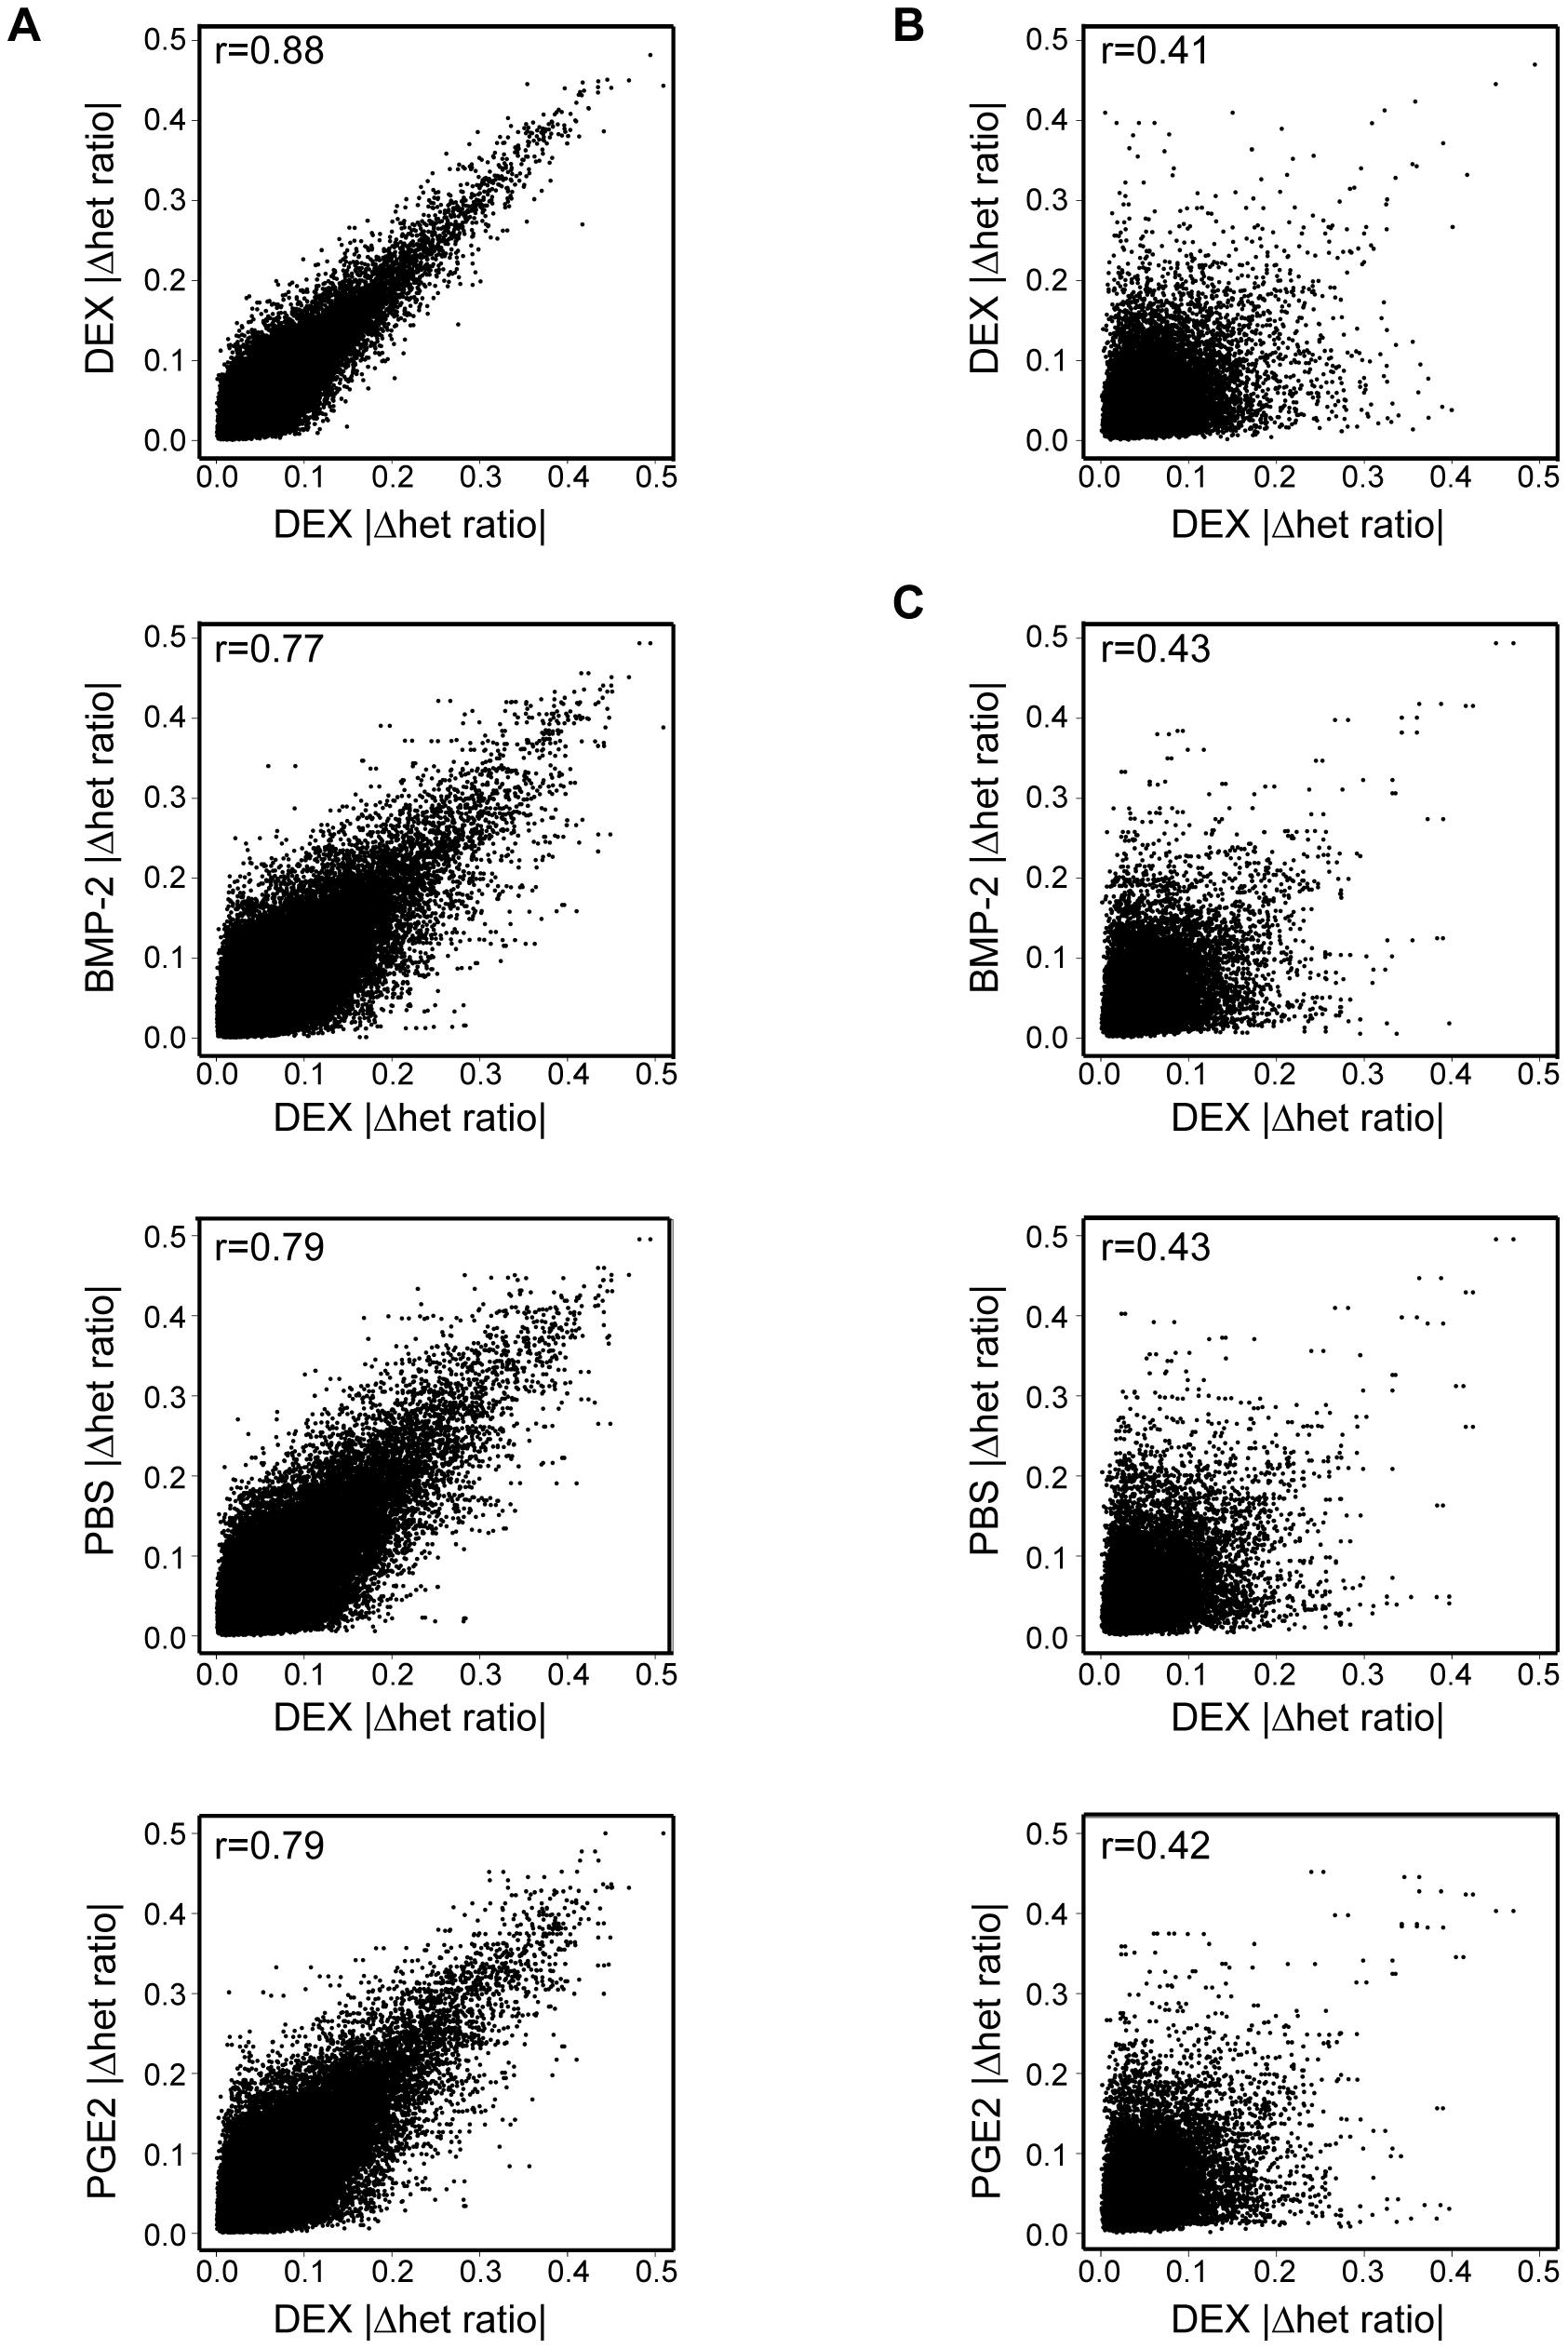 Global effect of environmental perturbation on allelic <i>cis</i>-regulation.